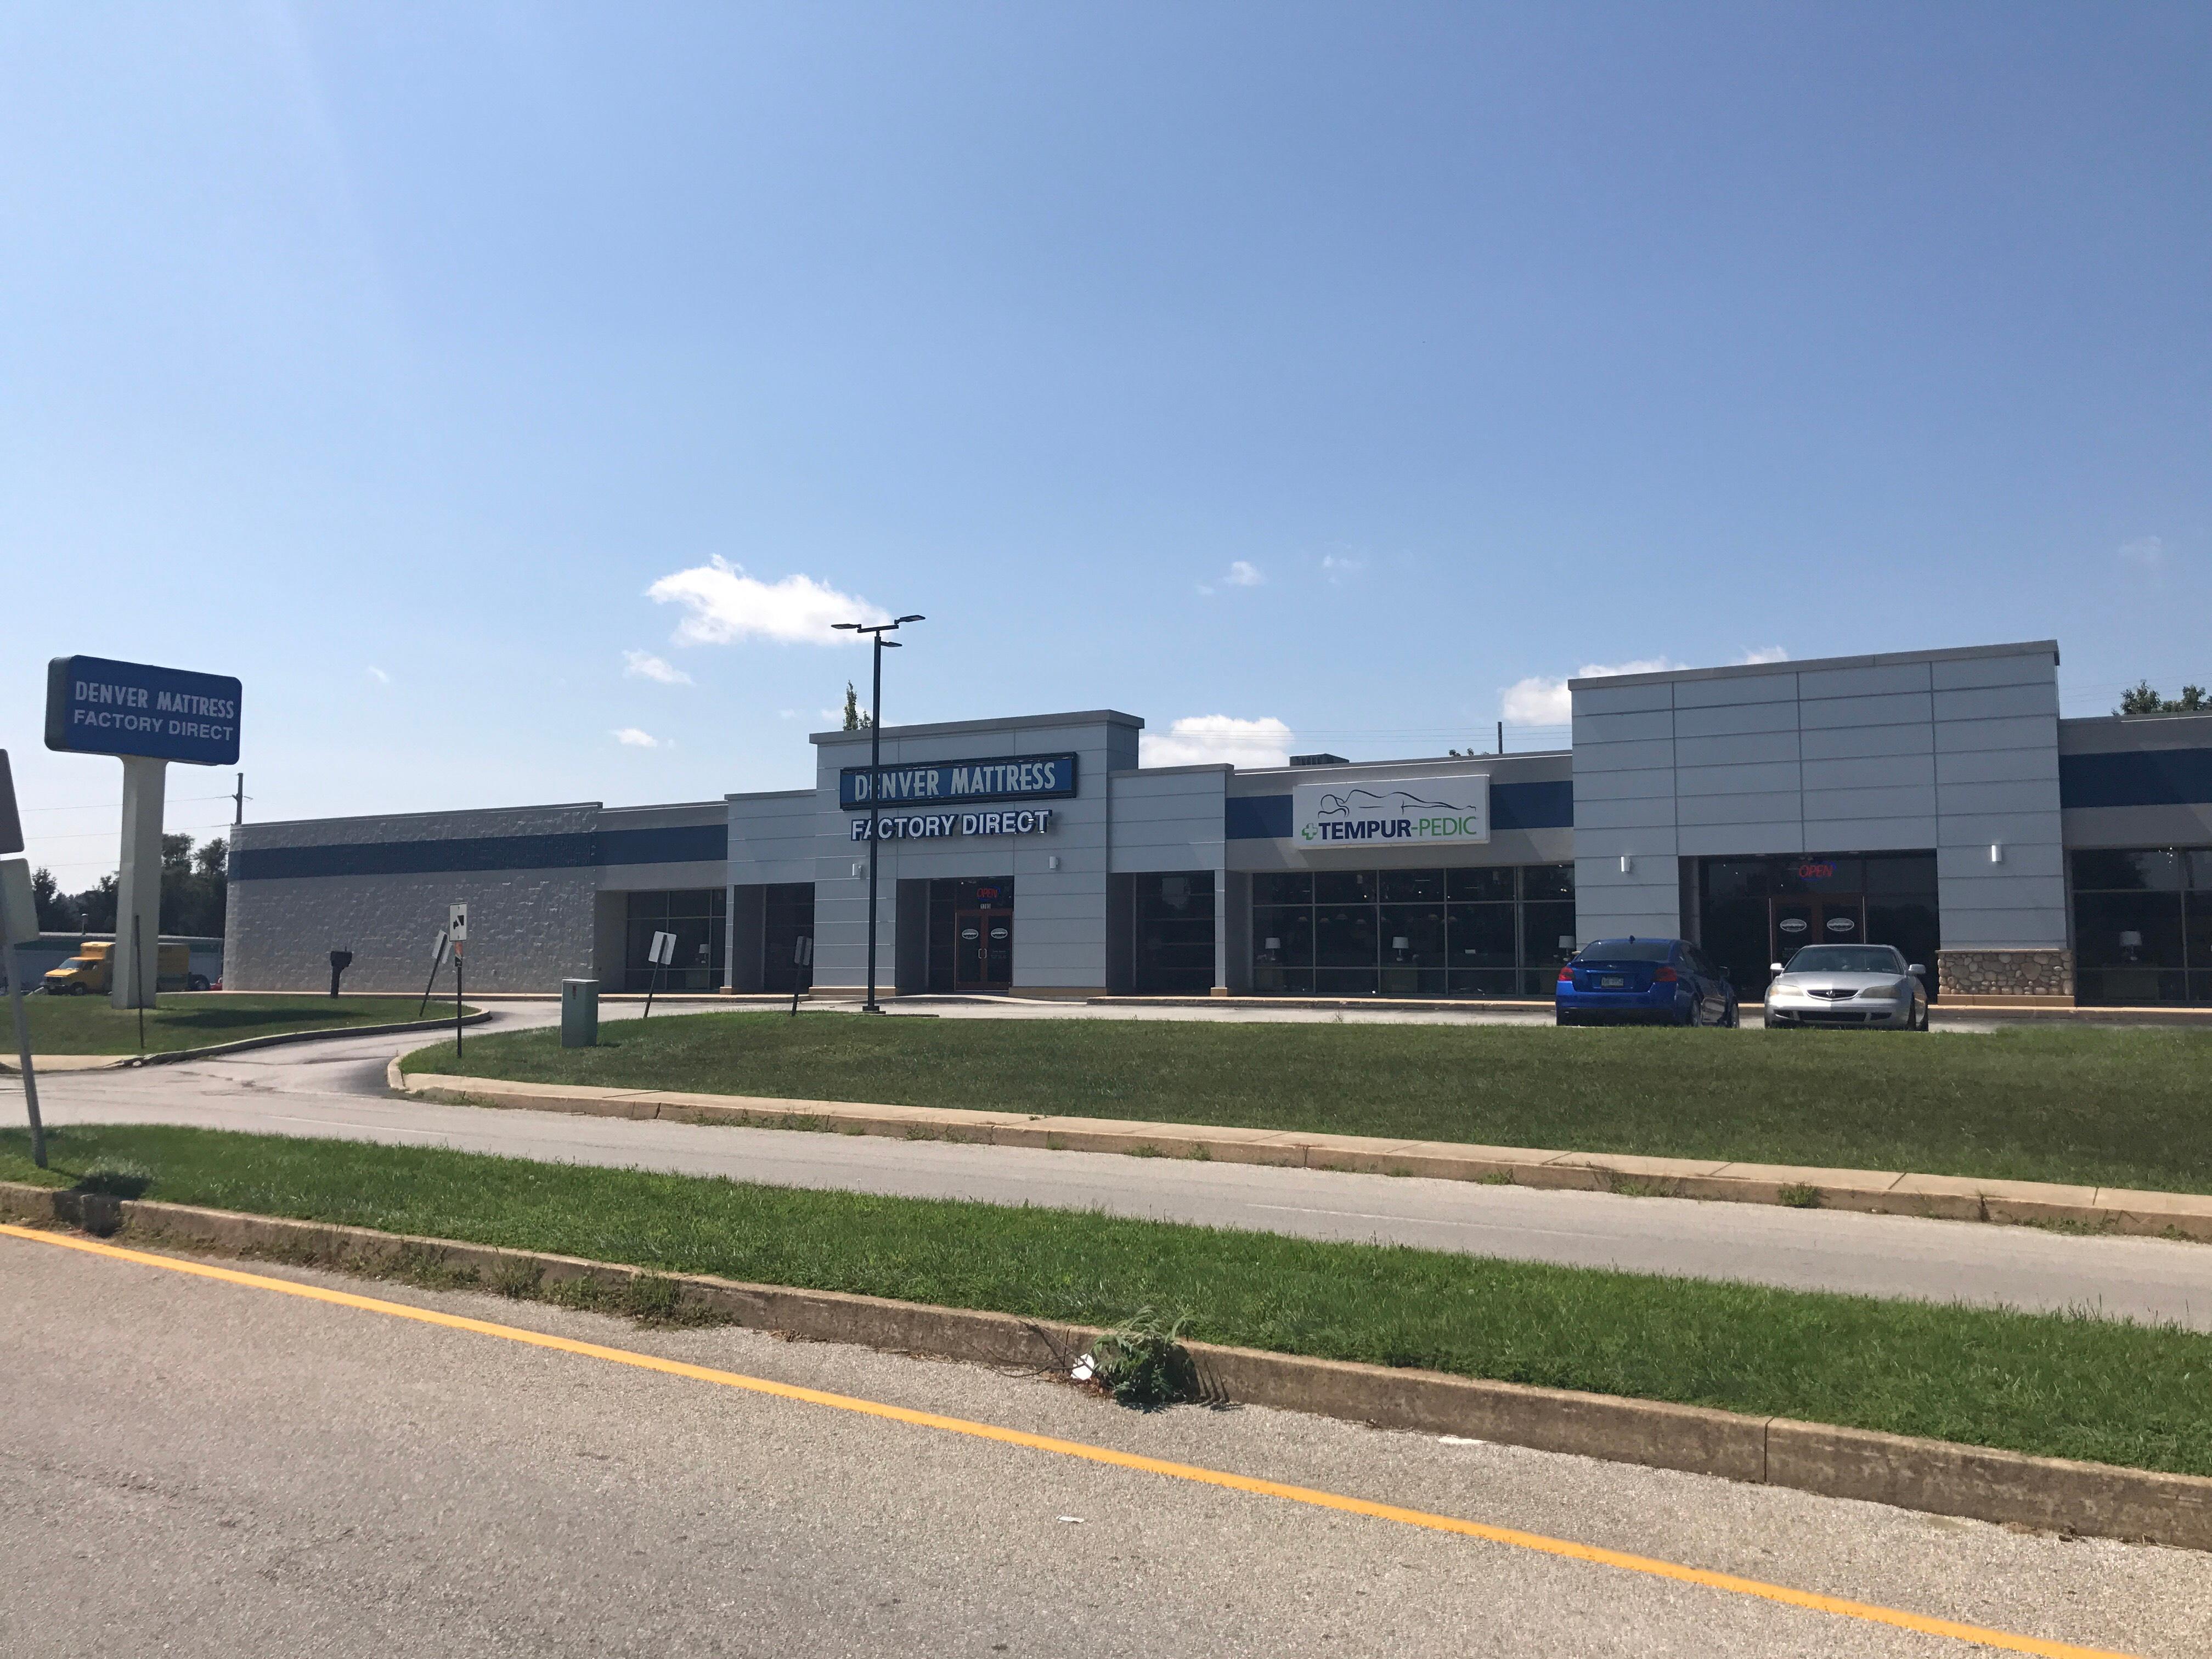 Denver Mattress Company York Pennsylvania Pa